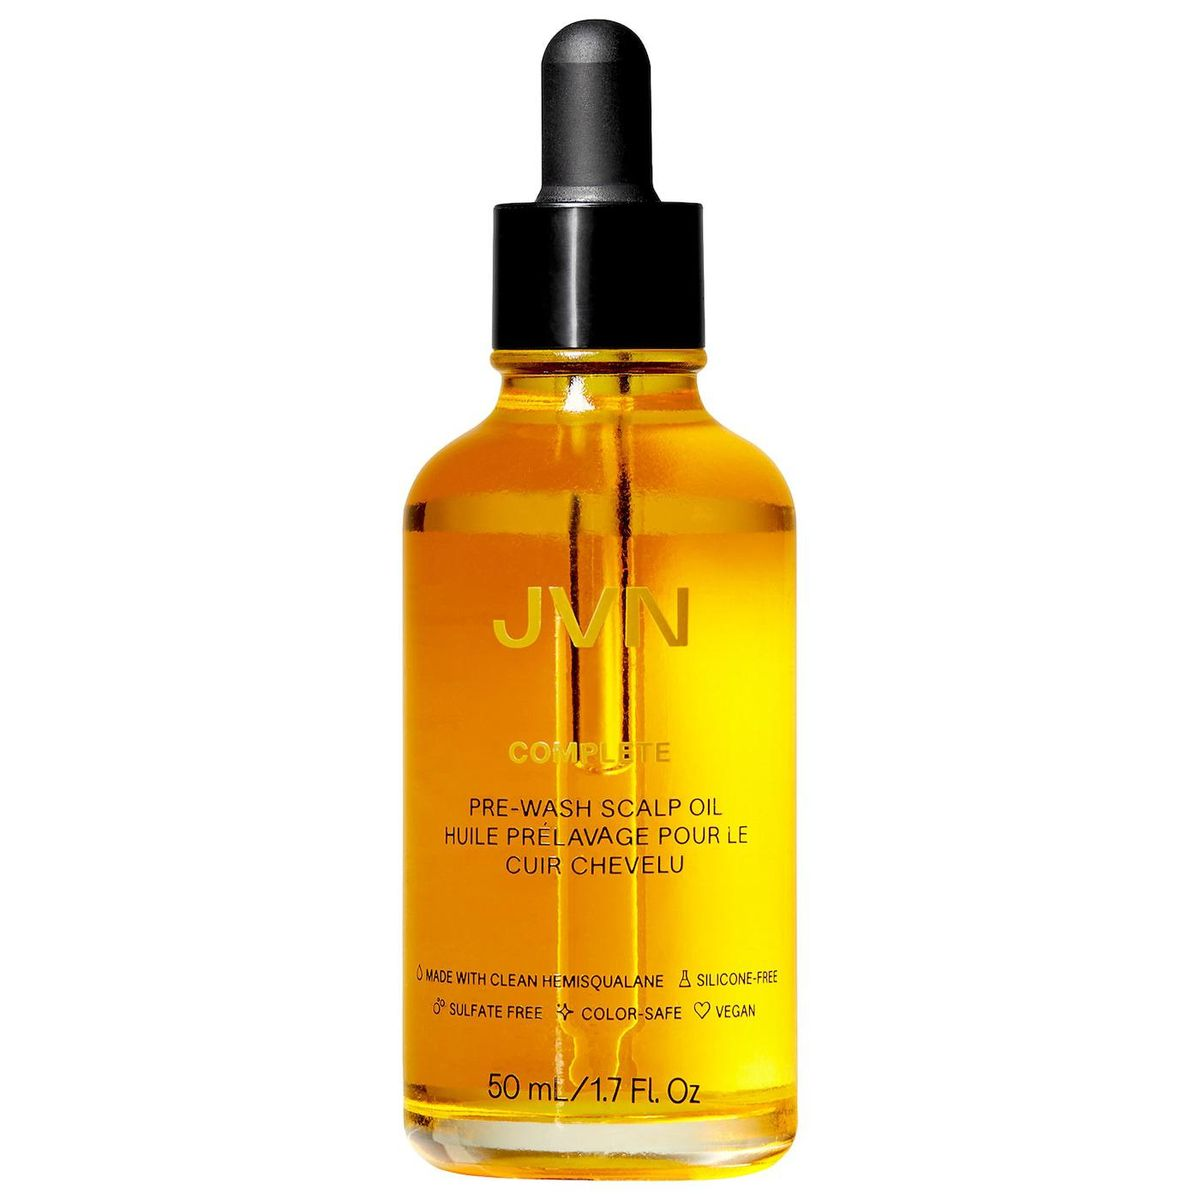 jvn complete pre wash hair oil